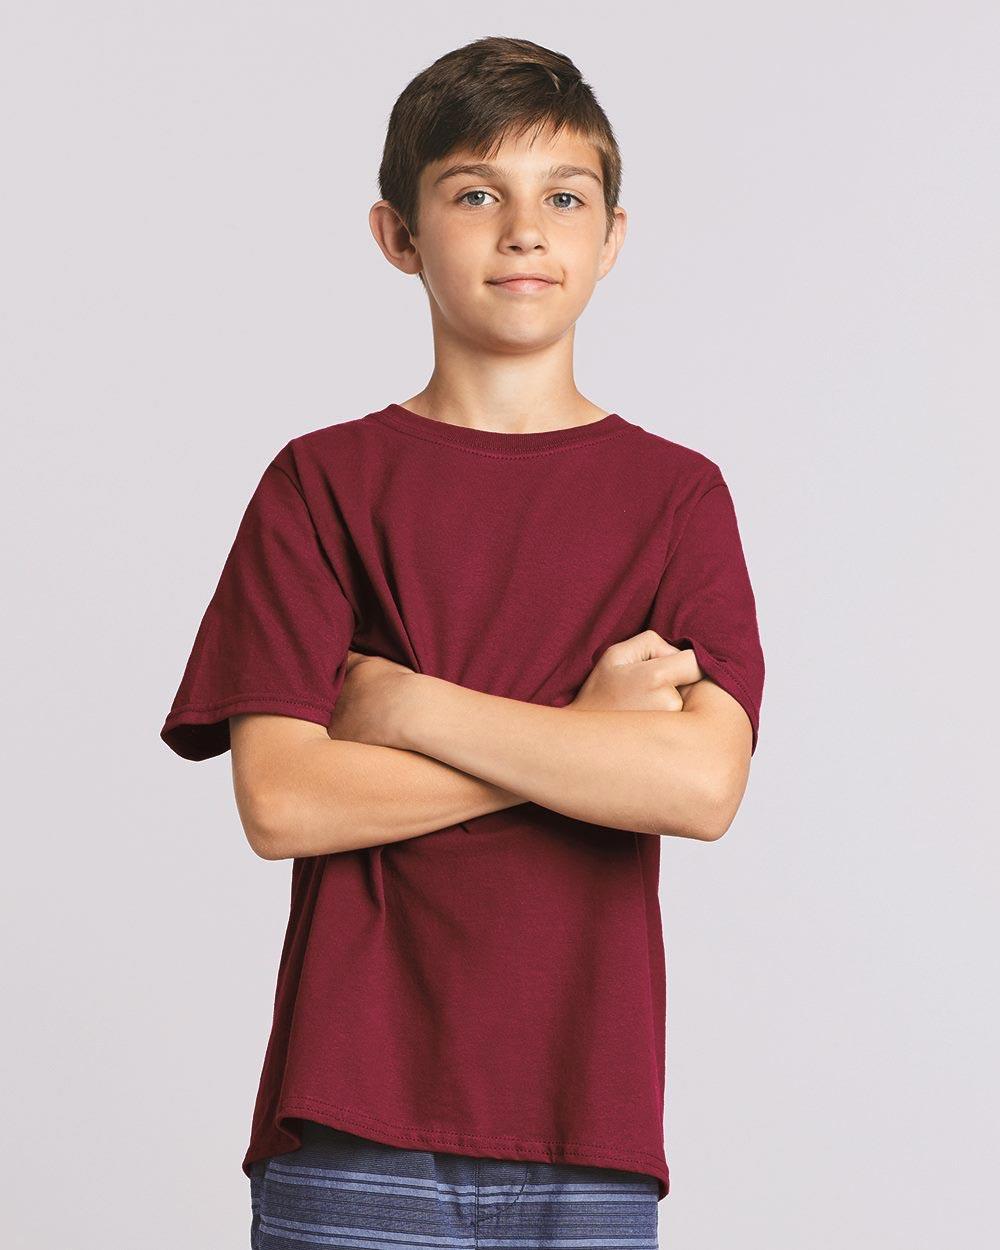 Gildan 5000B - Heavy Cotton Youth T-Shirt